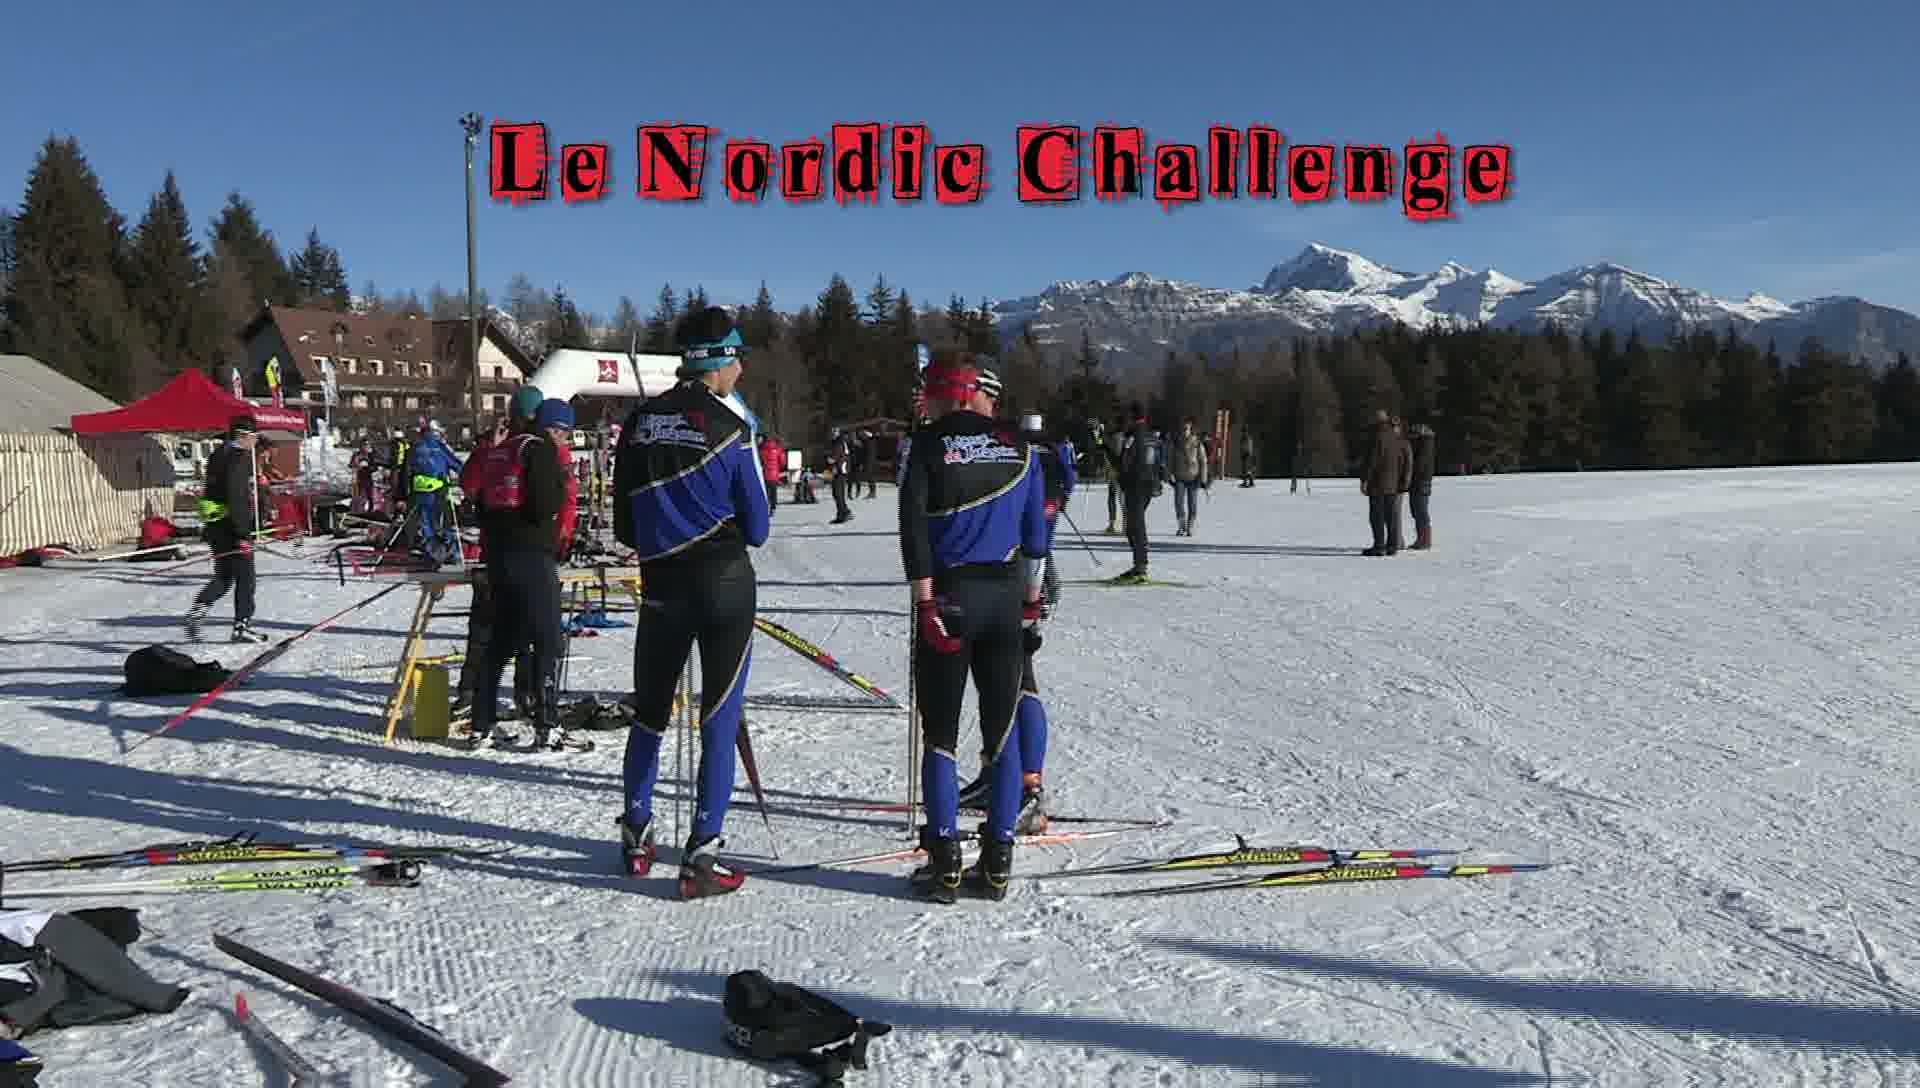 Nordic Challenge (Le)